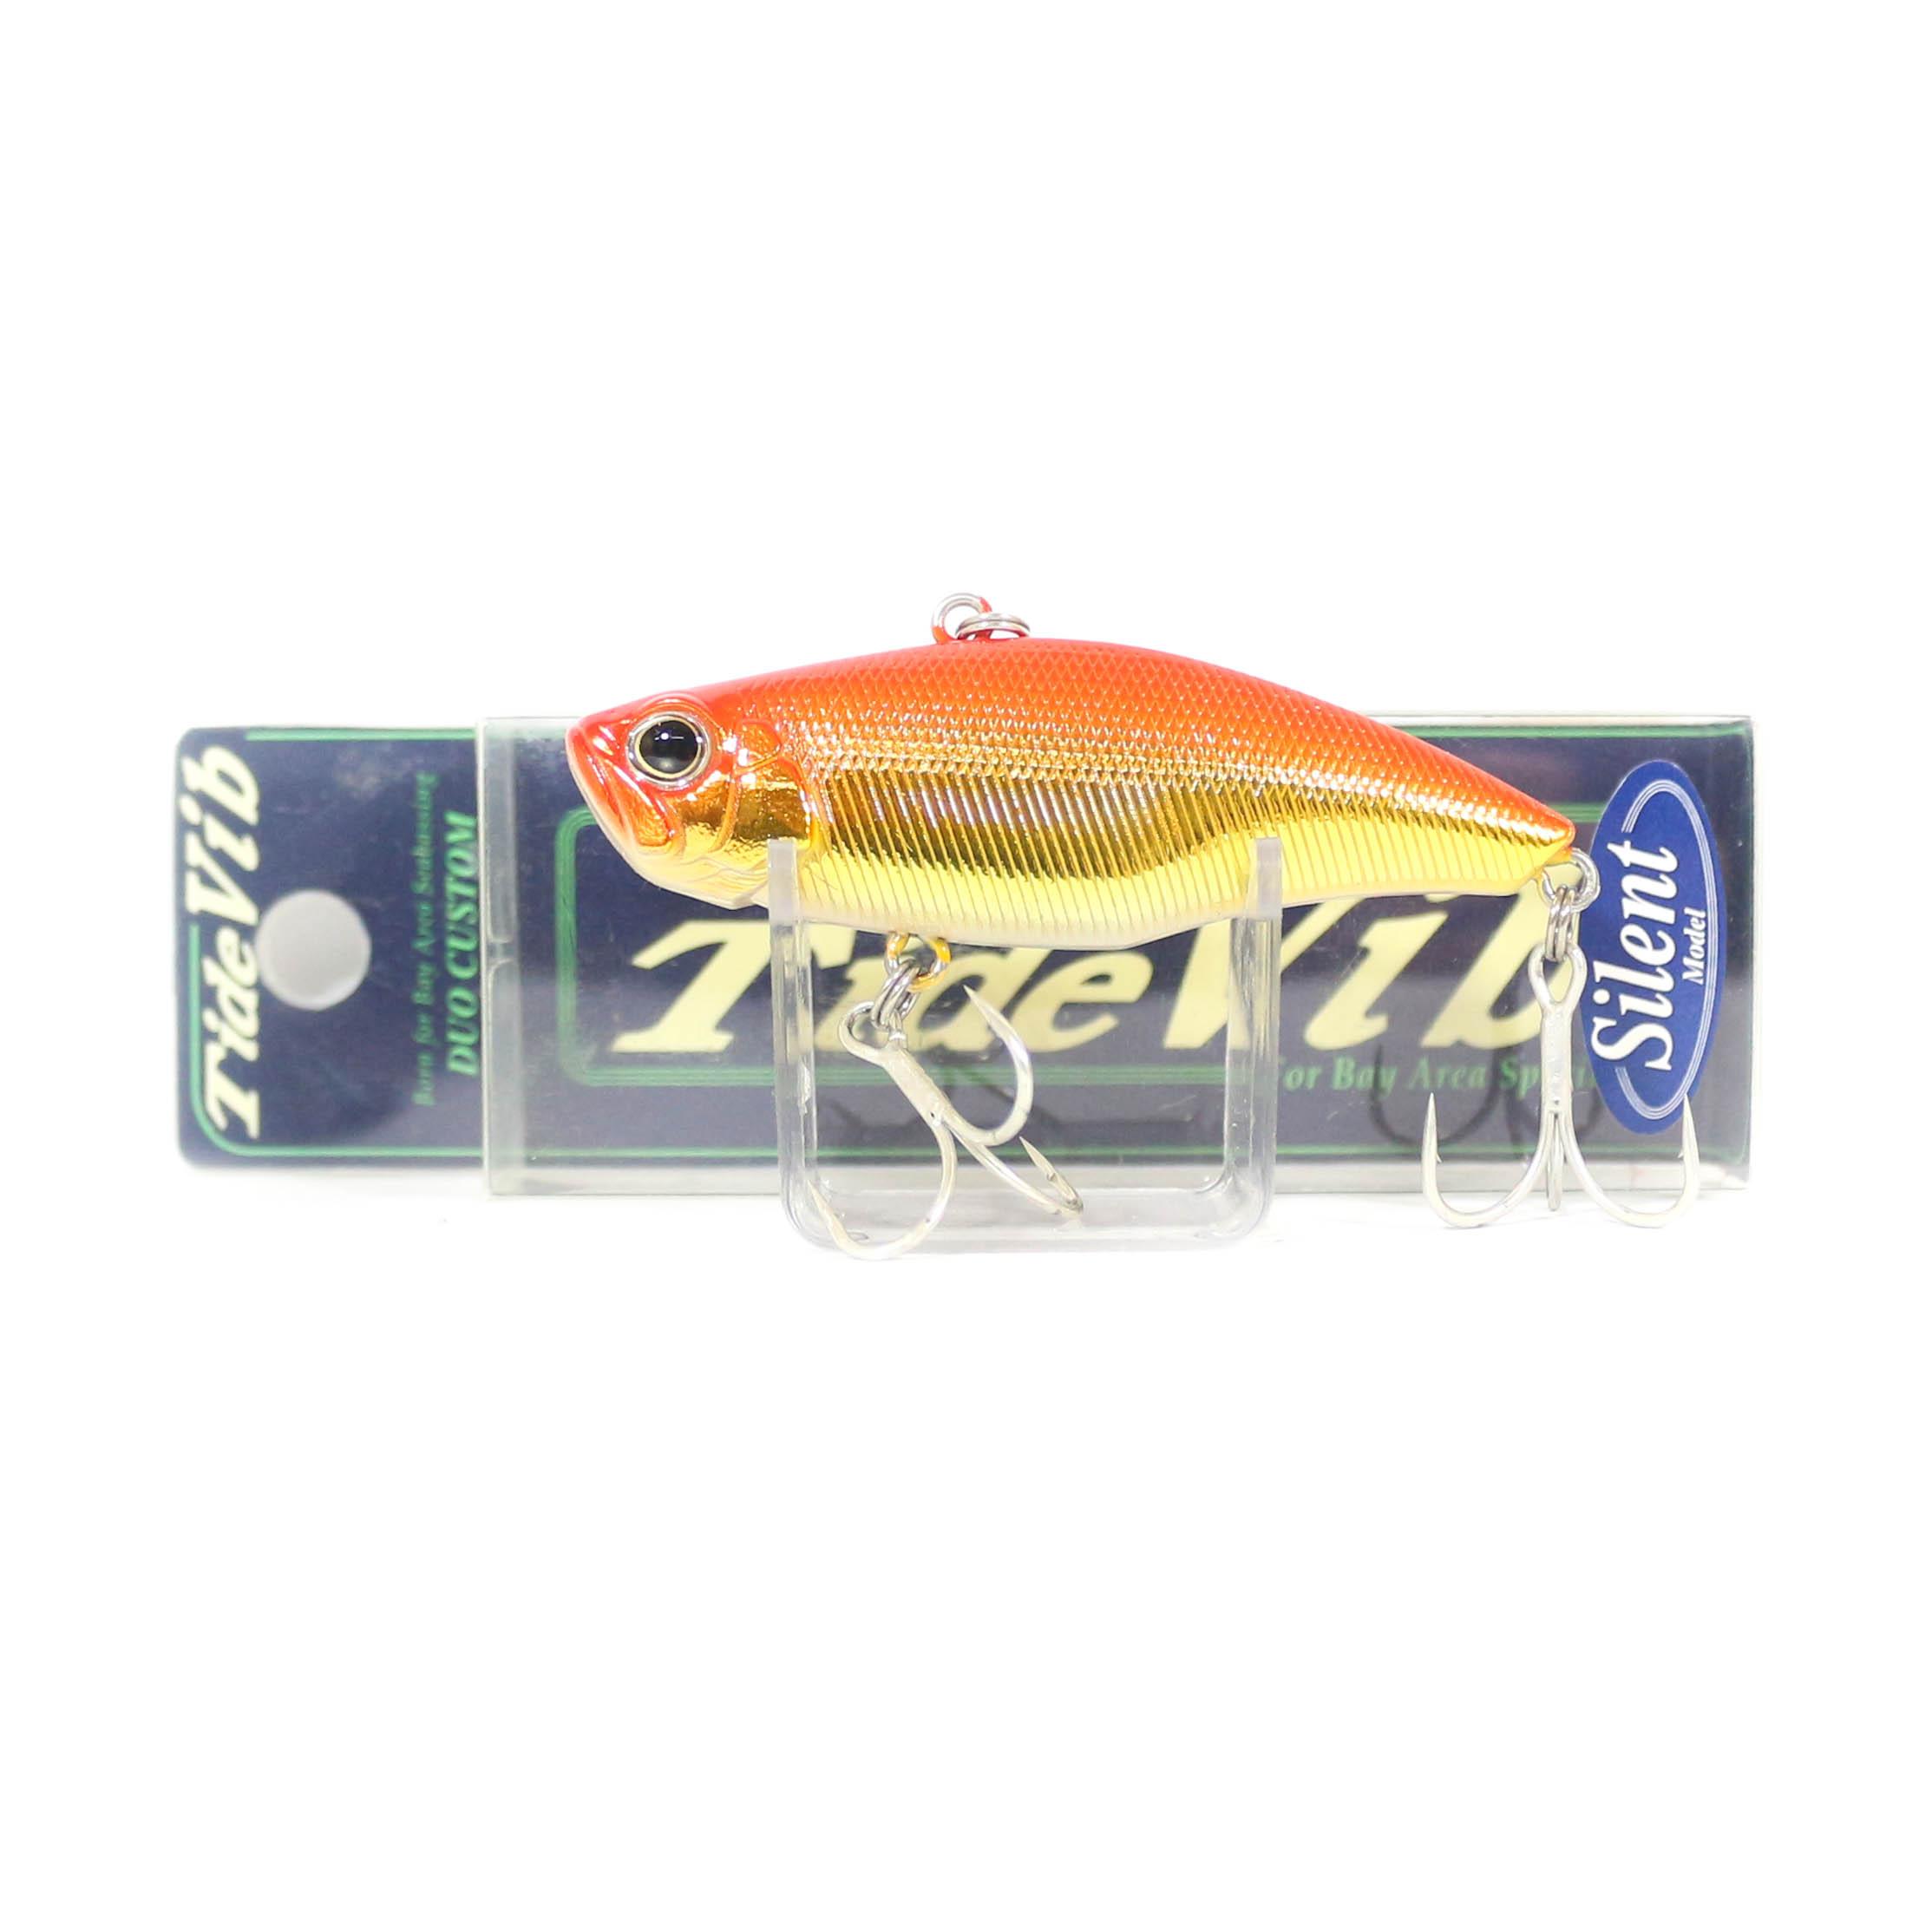 3656 Sale Duo Realis Fangbait 140SR Floating Lure ADA3305